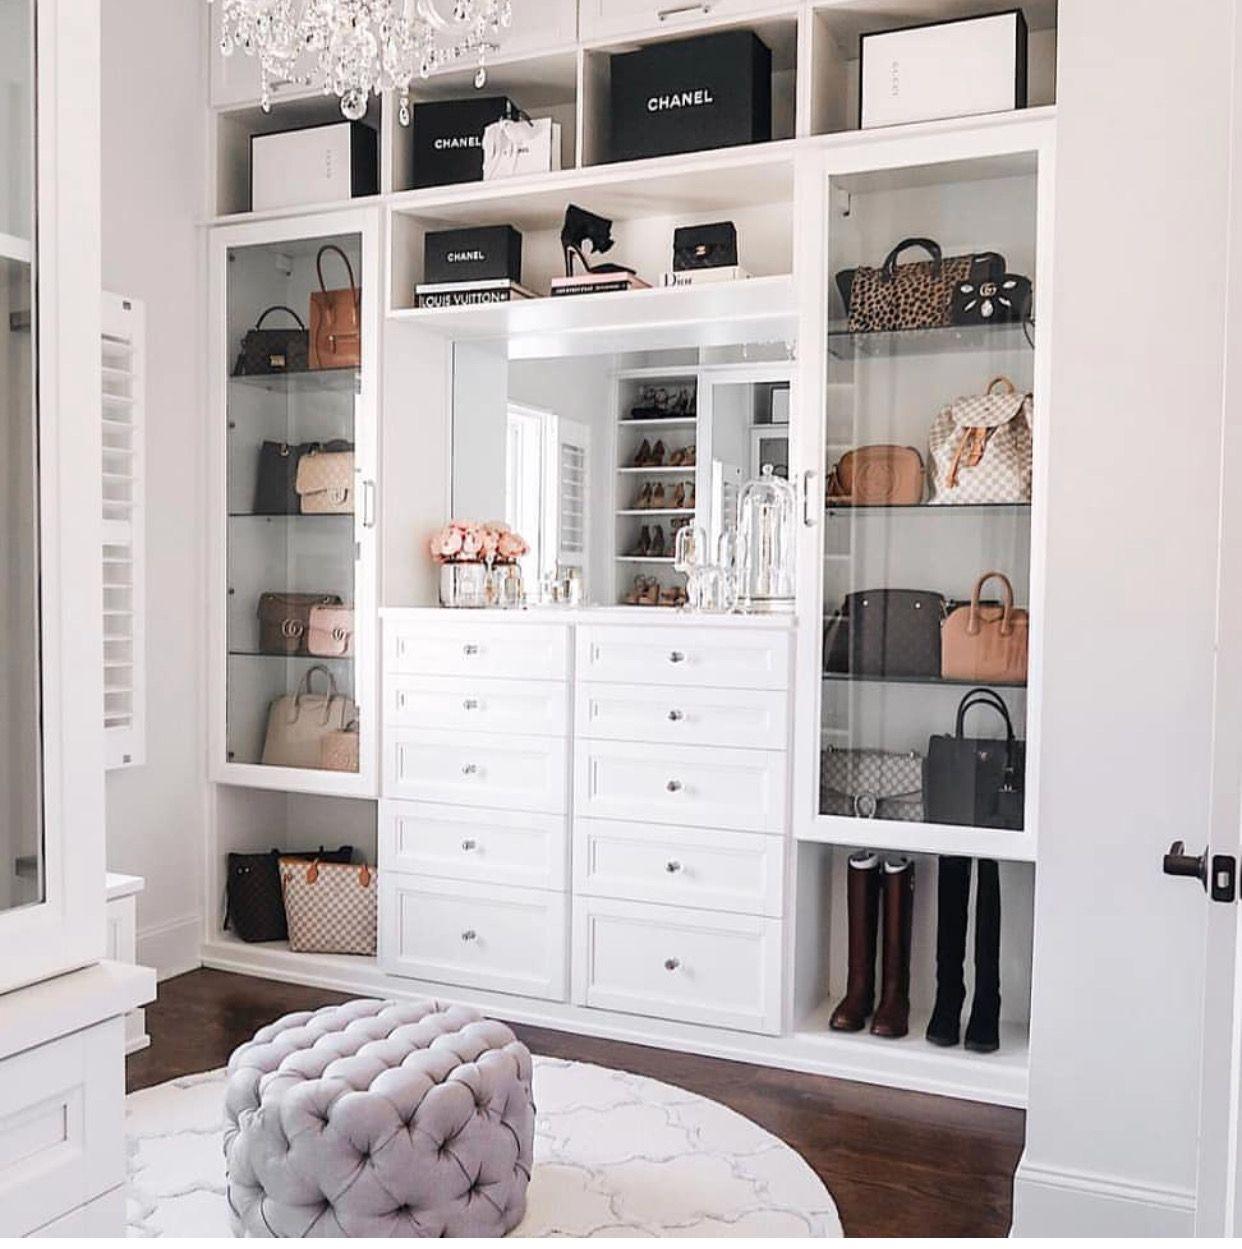 Pin By Madison Sullivan On Dream Closet Closet Decor Master Bedroom Closet Closet Design